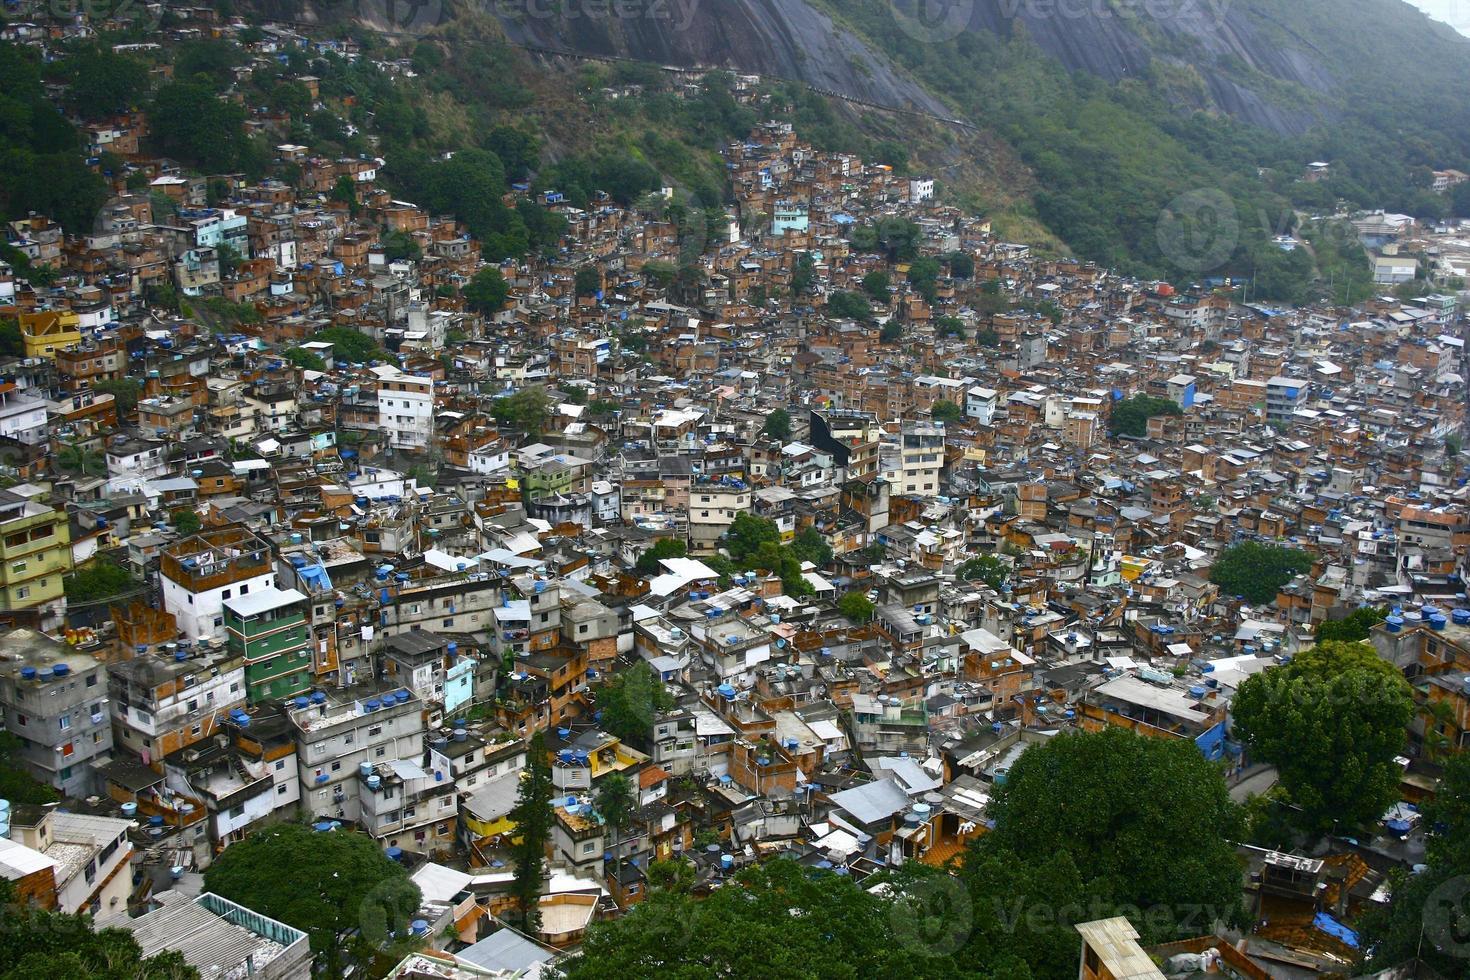 Favela in collina foto